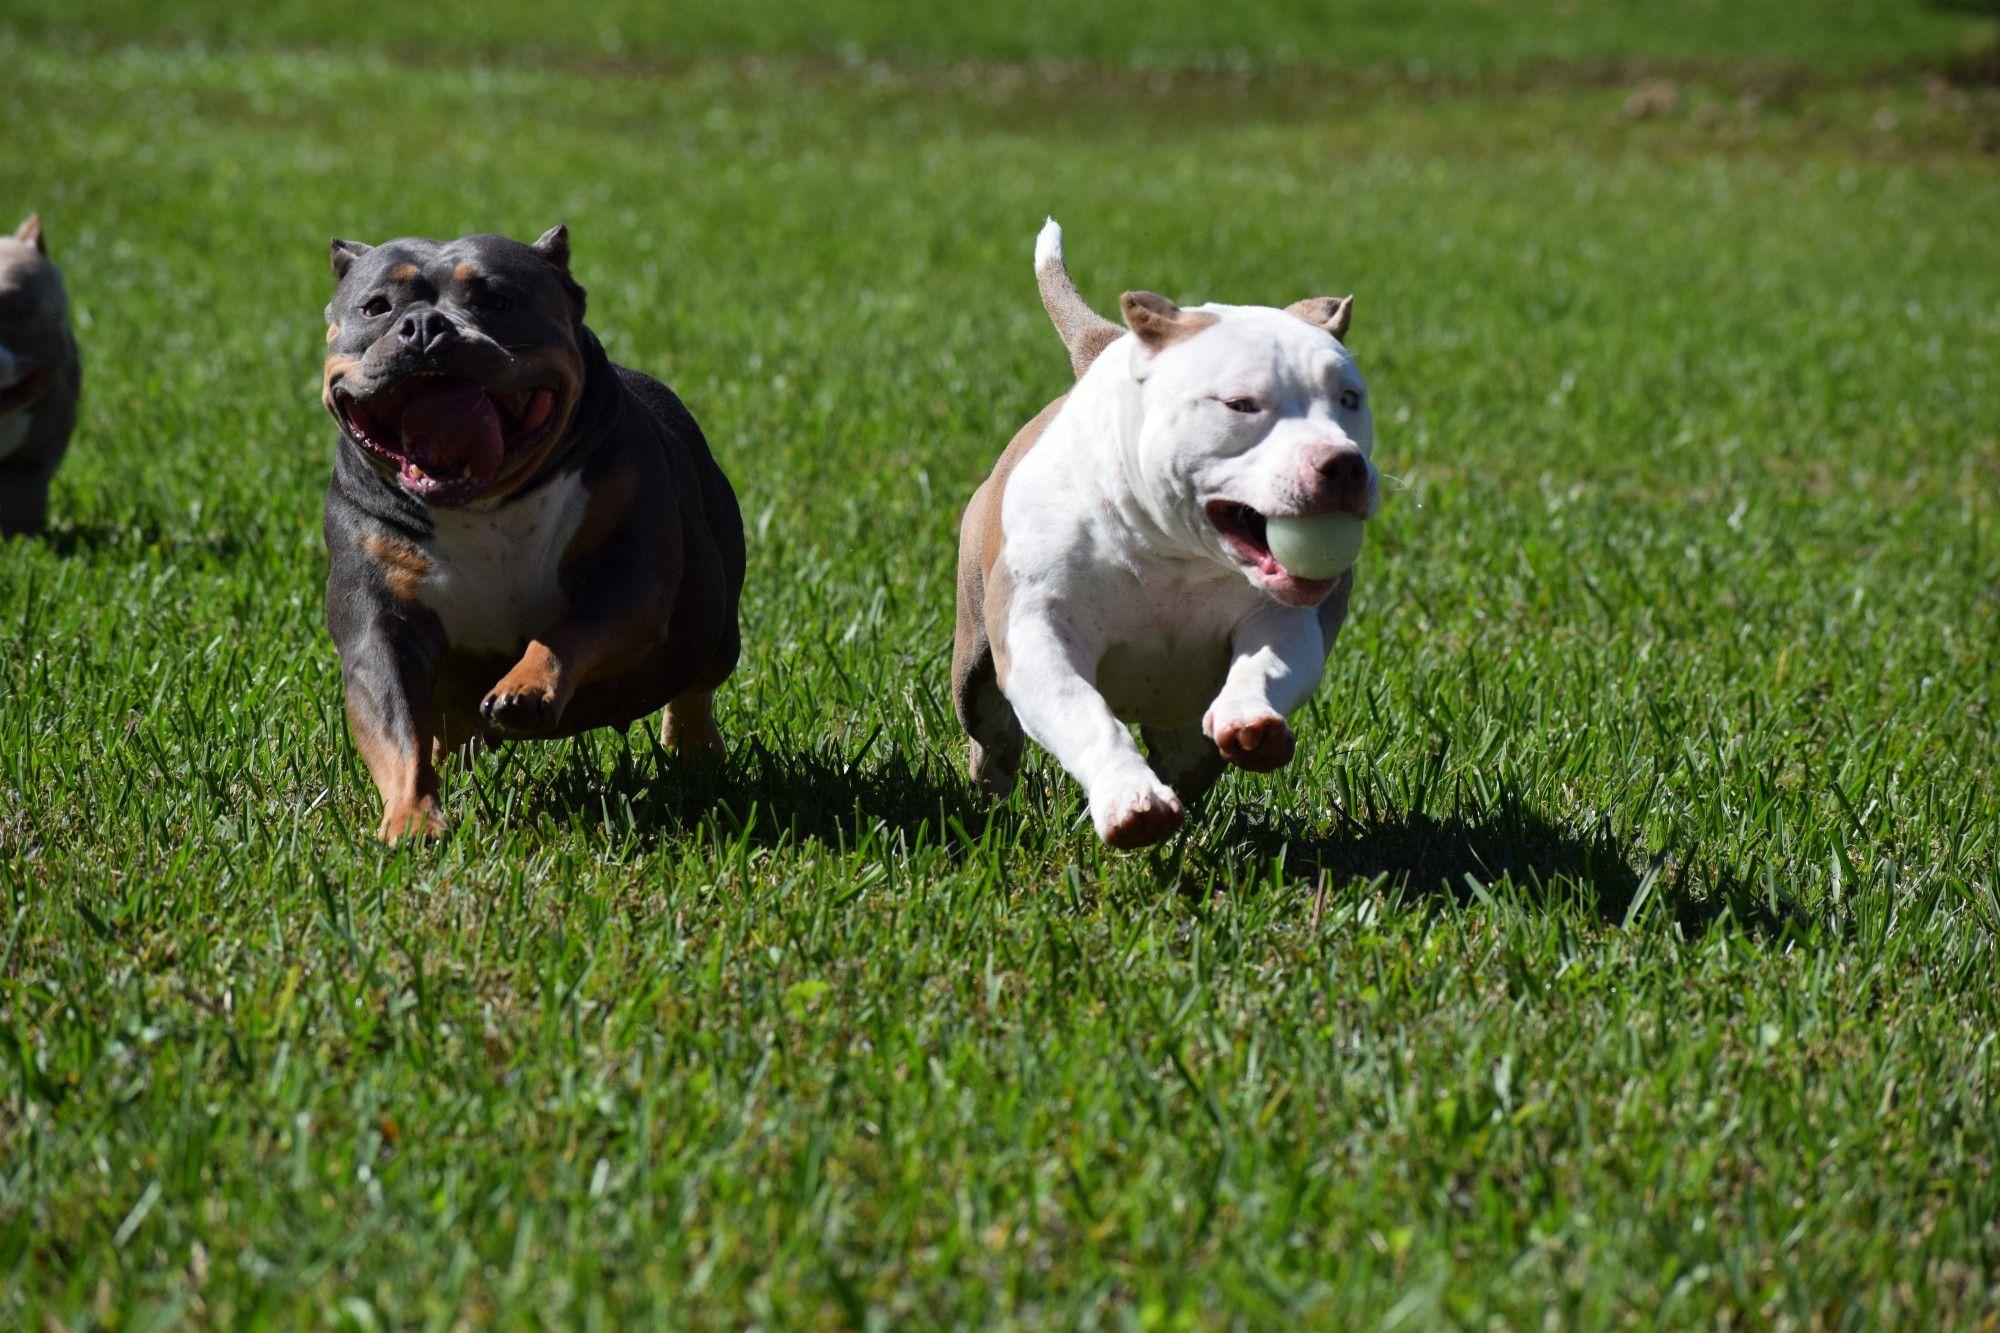 VENOMLINE DISCUSSES THE BEST DOG FOODS, SUPPLEMENTS